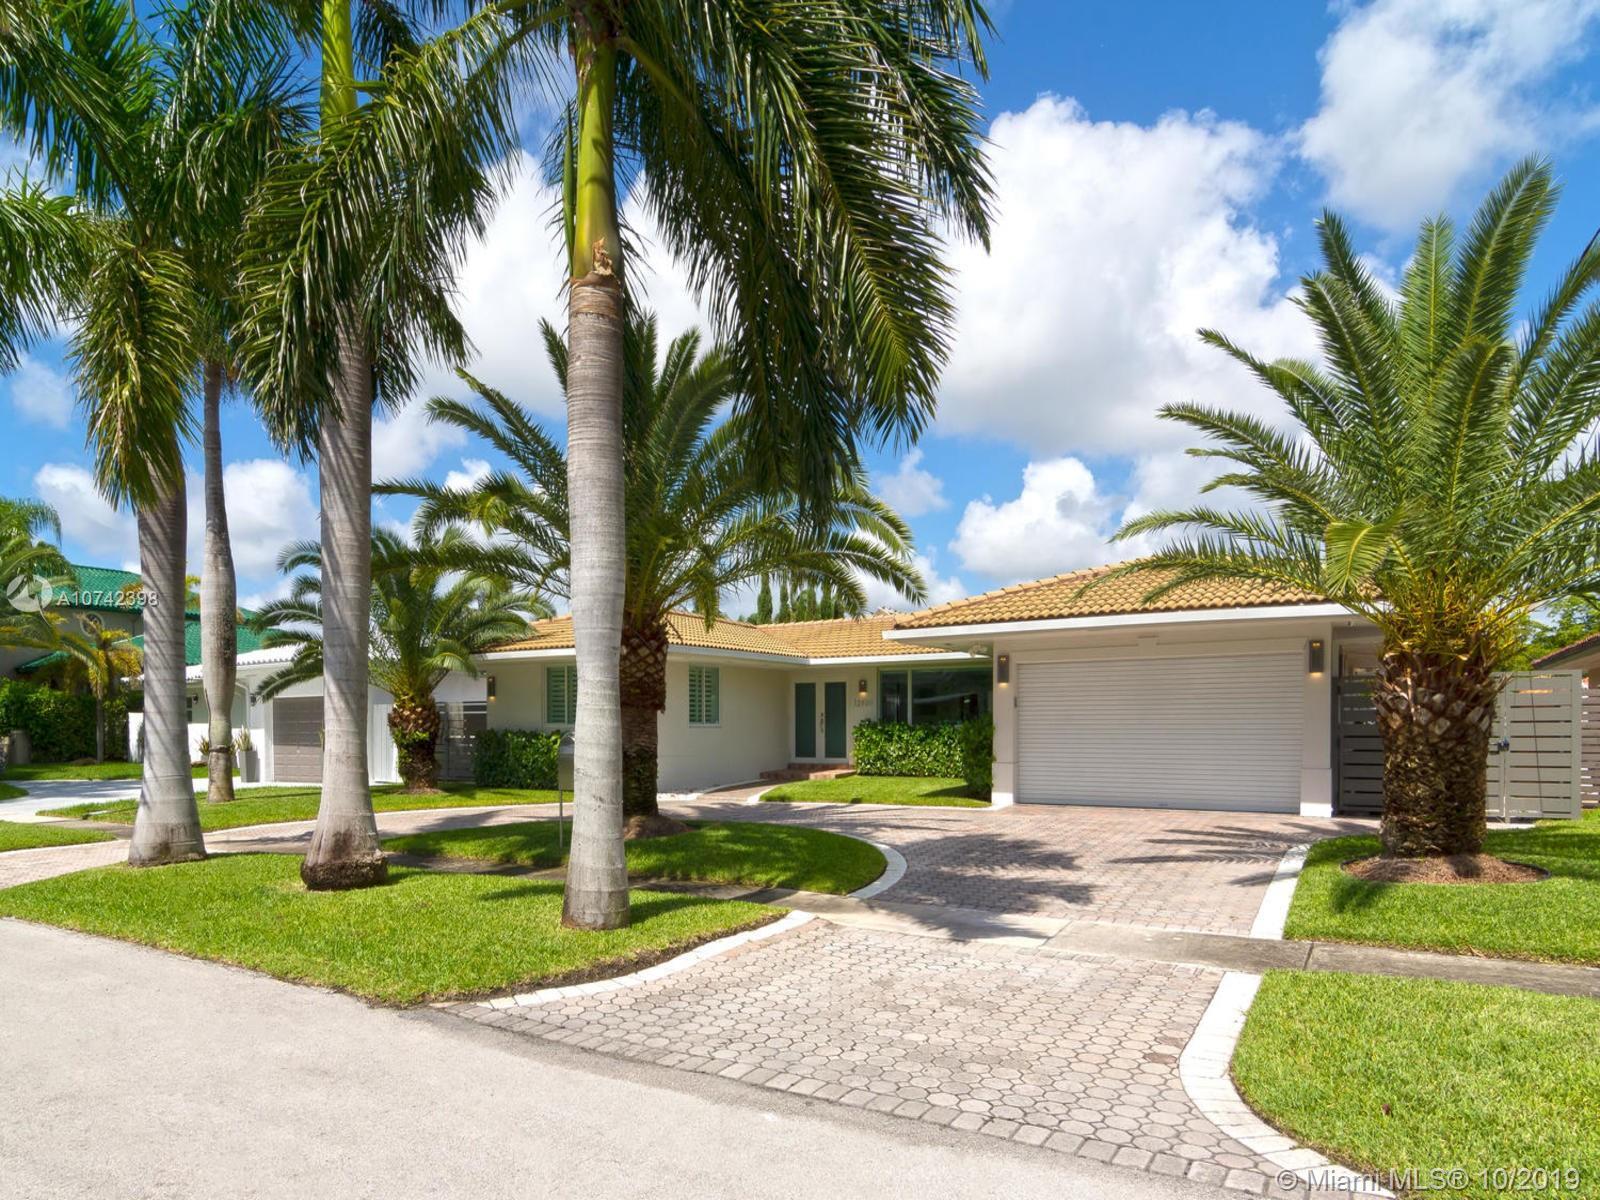 12930 Oleander Rd, North Miami, FL 33181